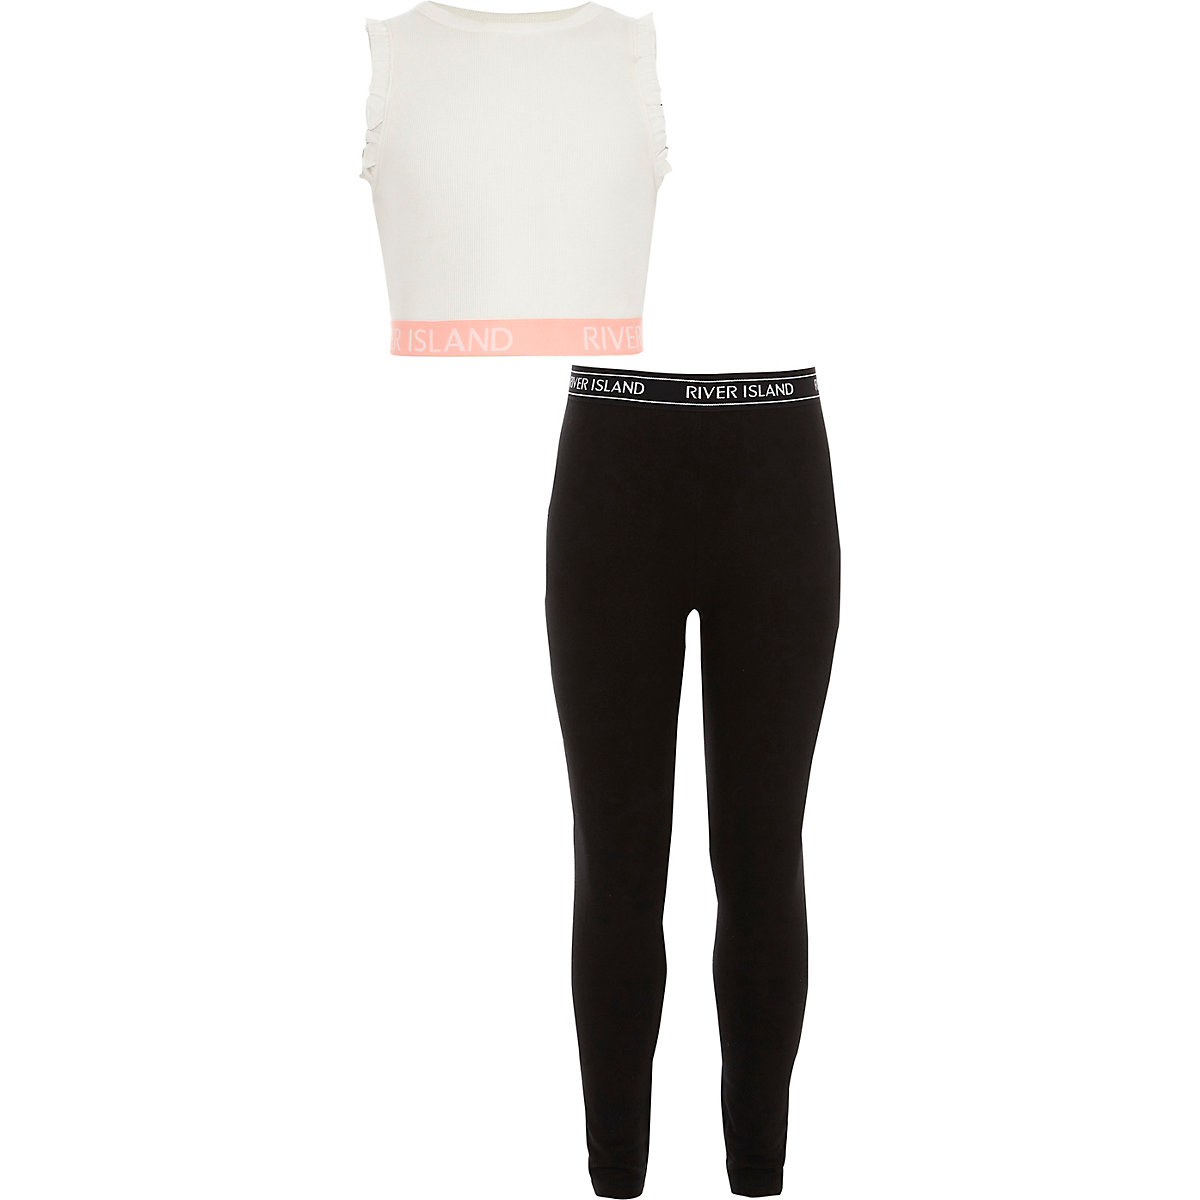 RI – Ensemble legging et crop top blanc pour fille